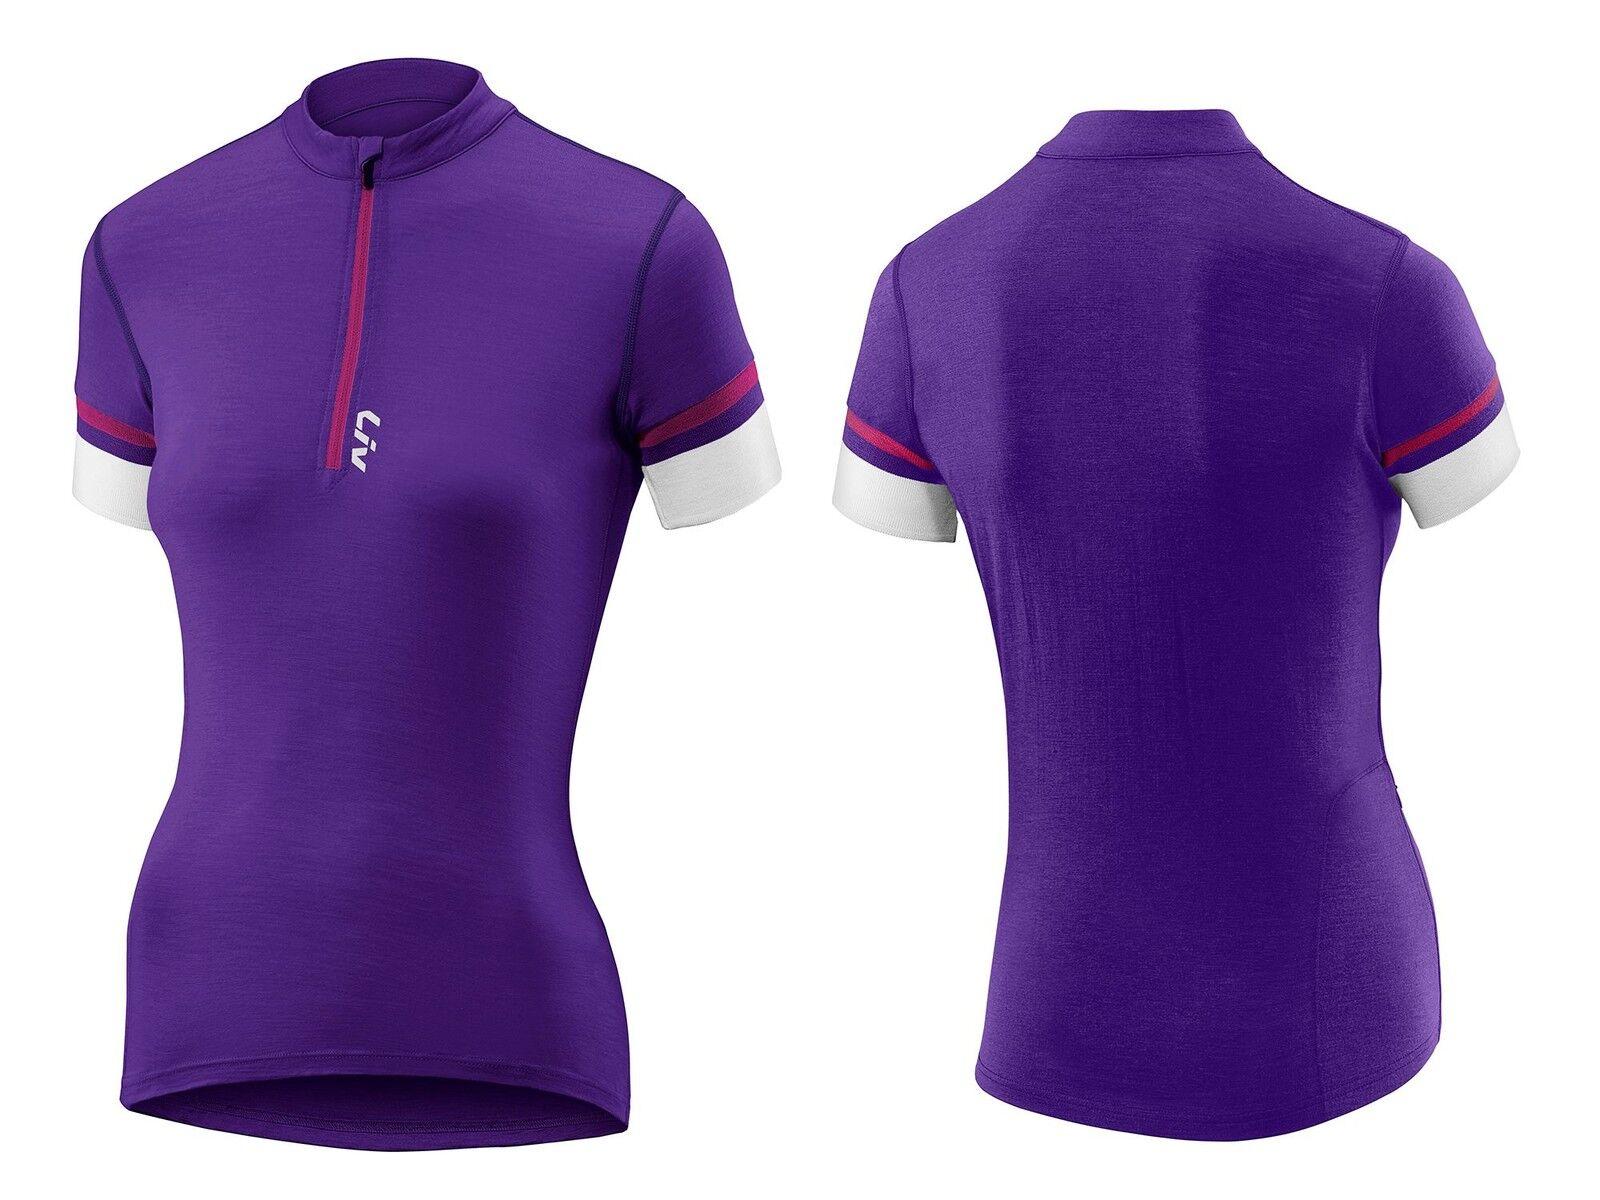 Gigante Liv Ricca Shortsleeve Merino Jersey Camiseta purple purple women Woman